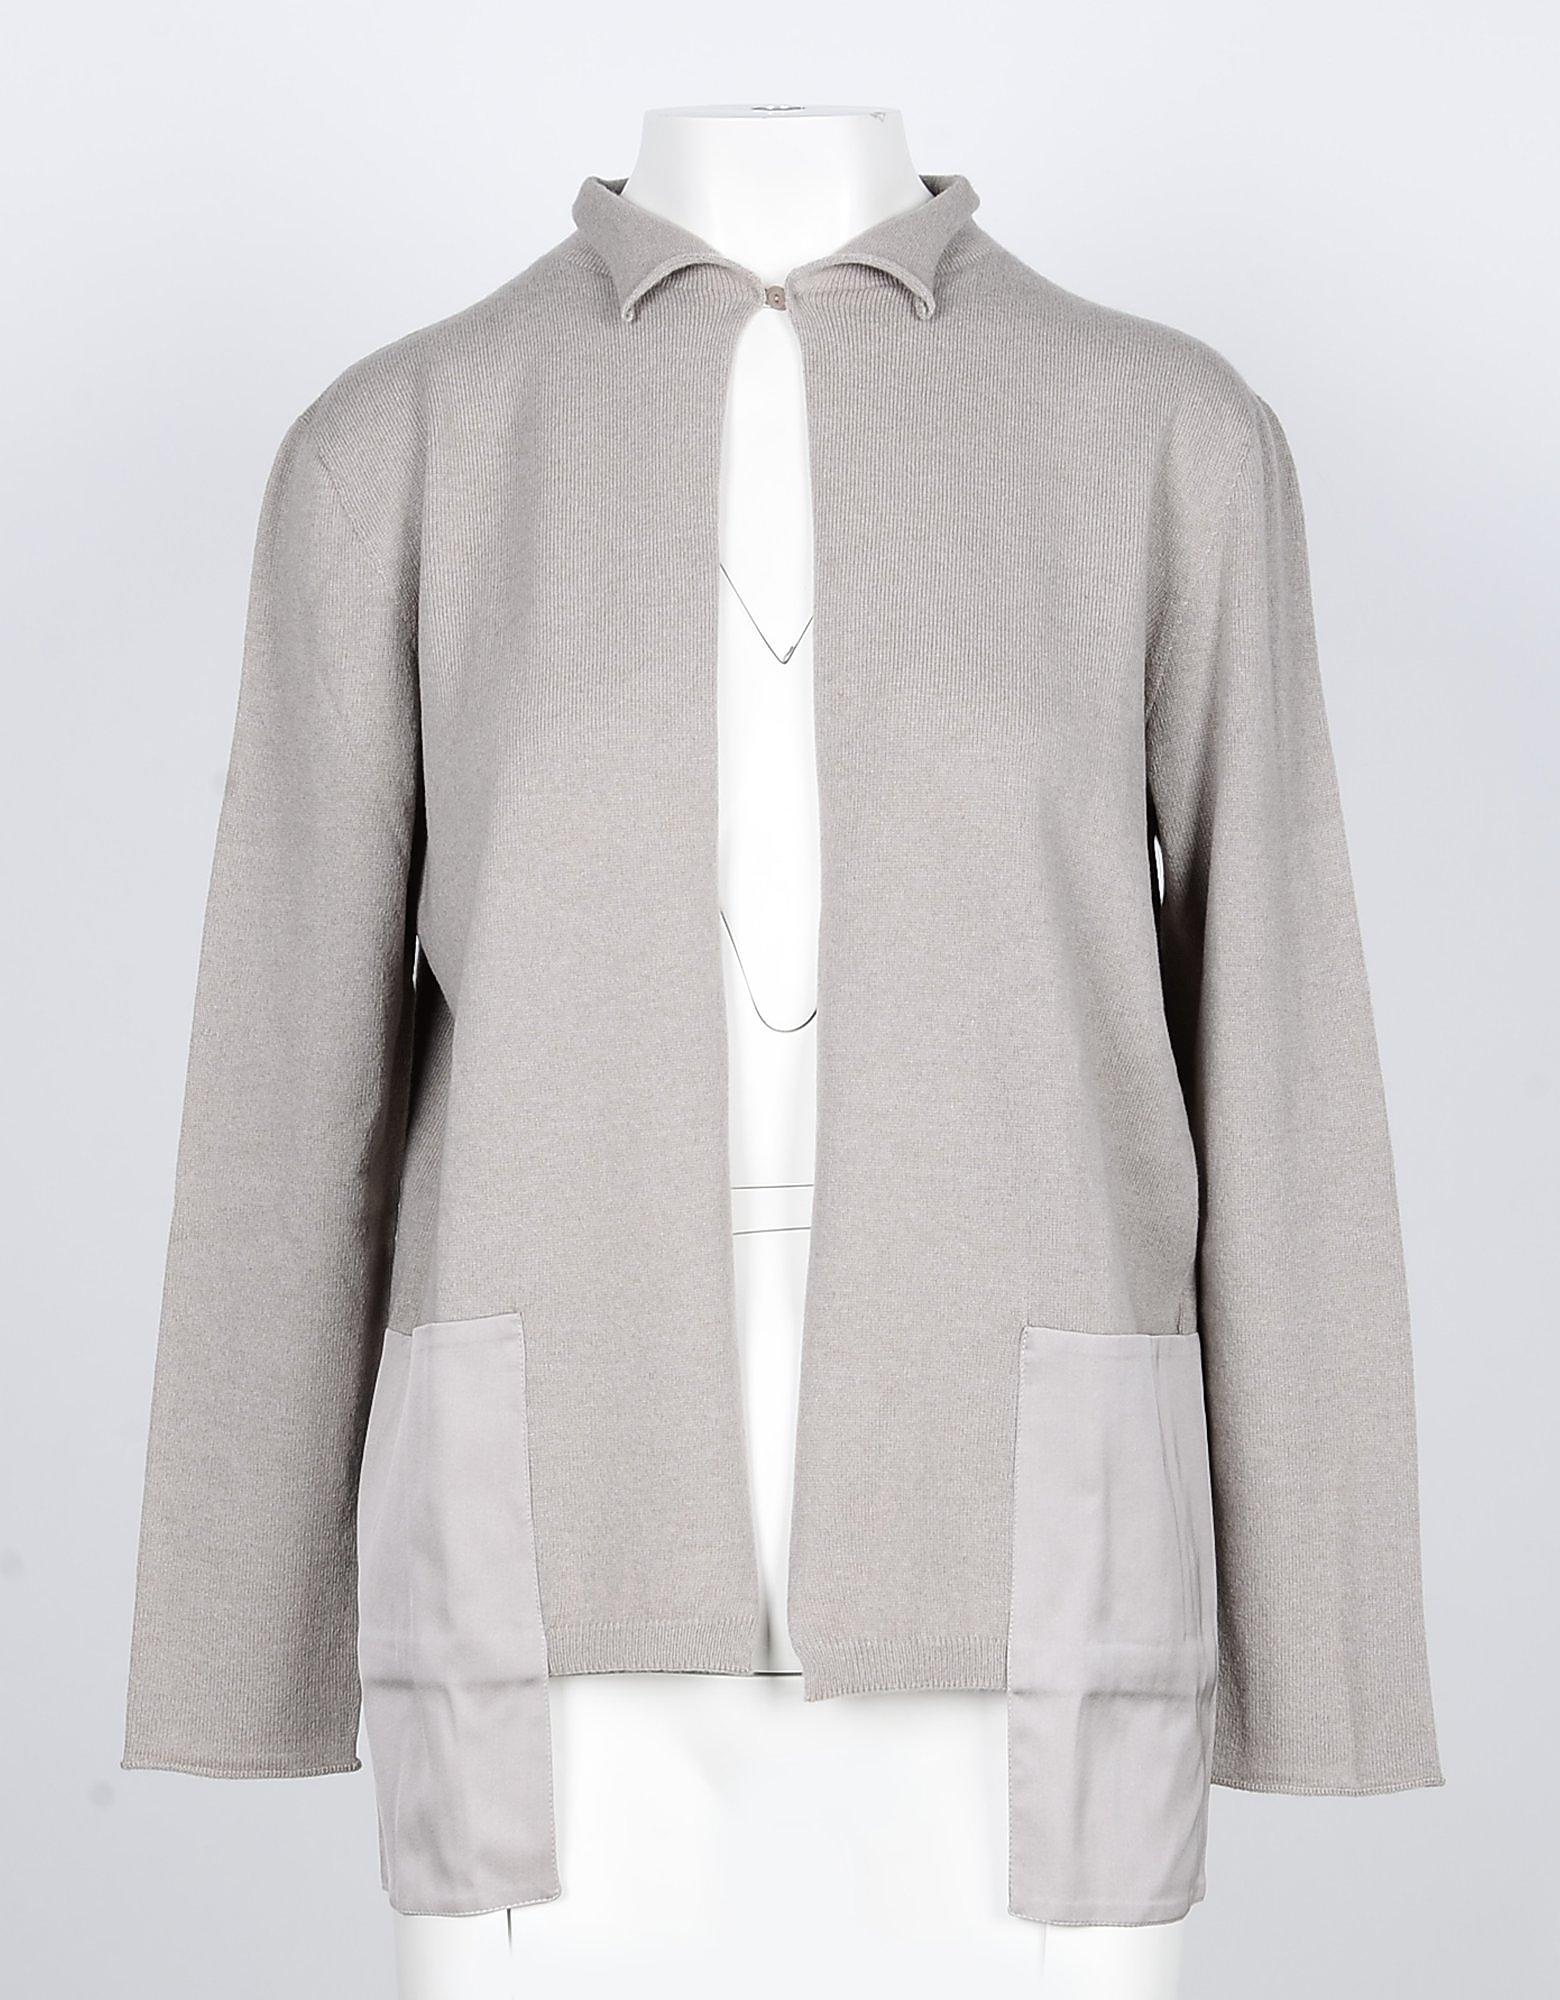 Lamberto Losani Designer Knitwear, Beige Wool, Silk and Cashmere Women's Cardigan Sweater